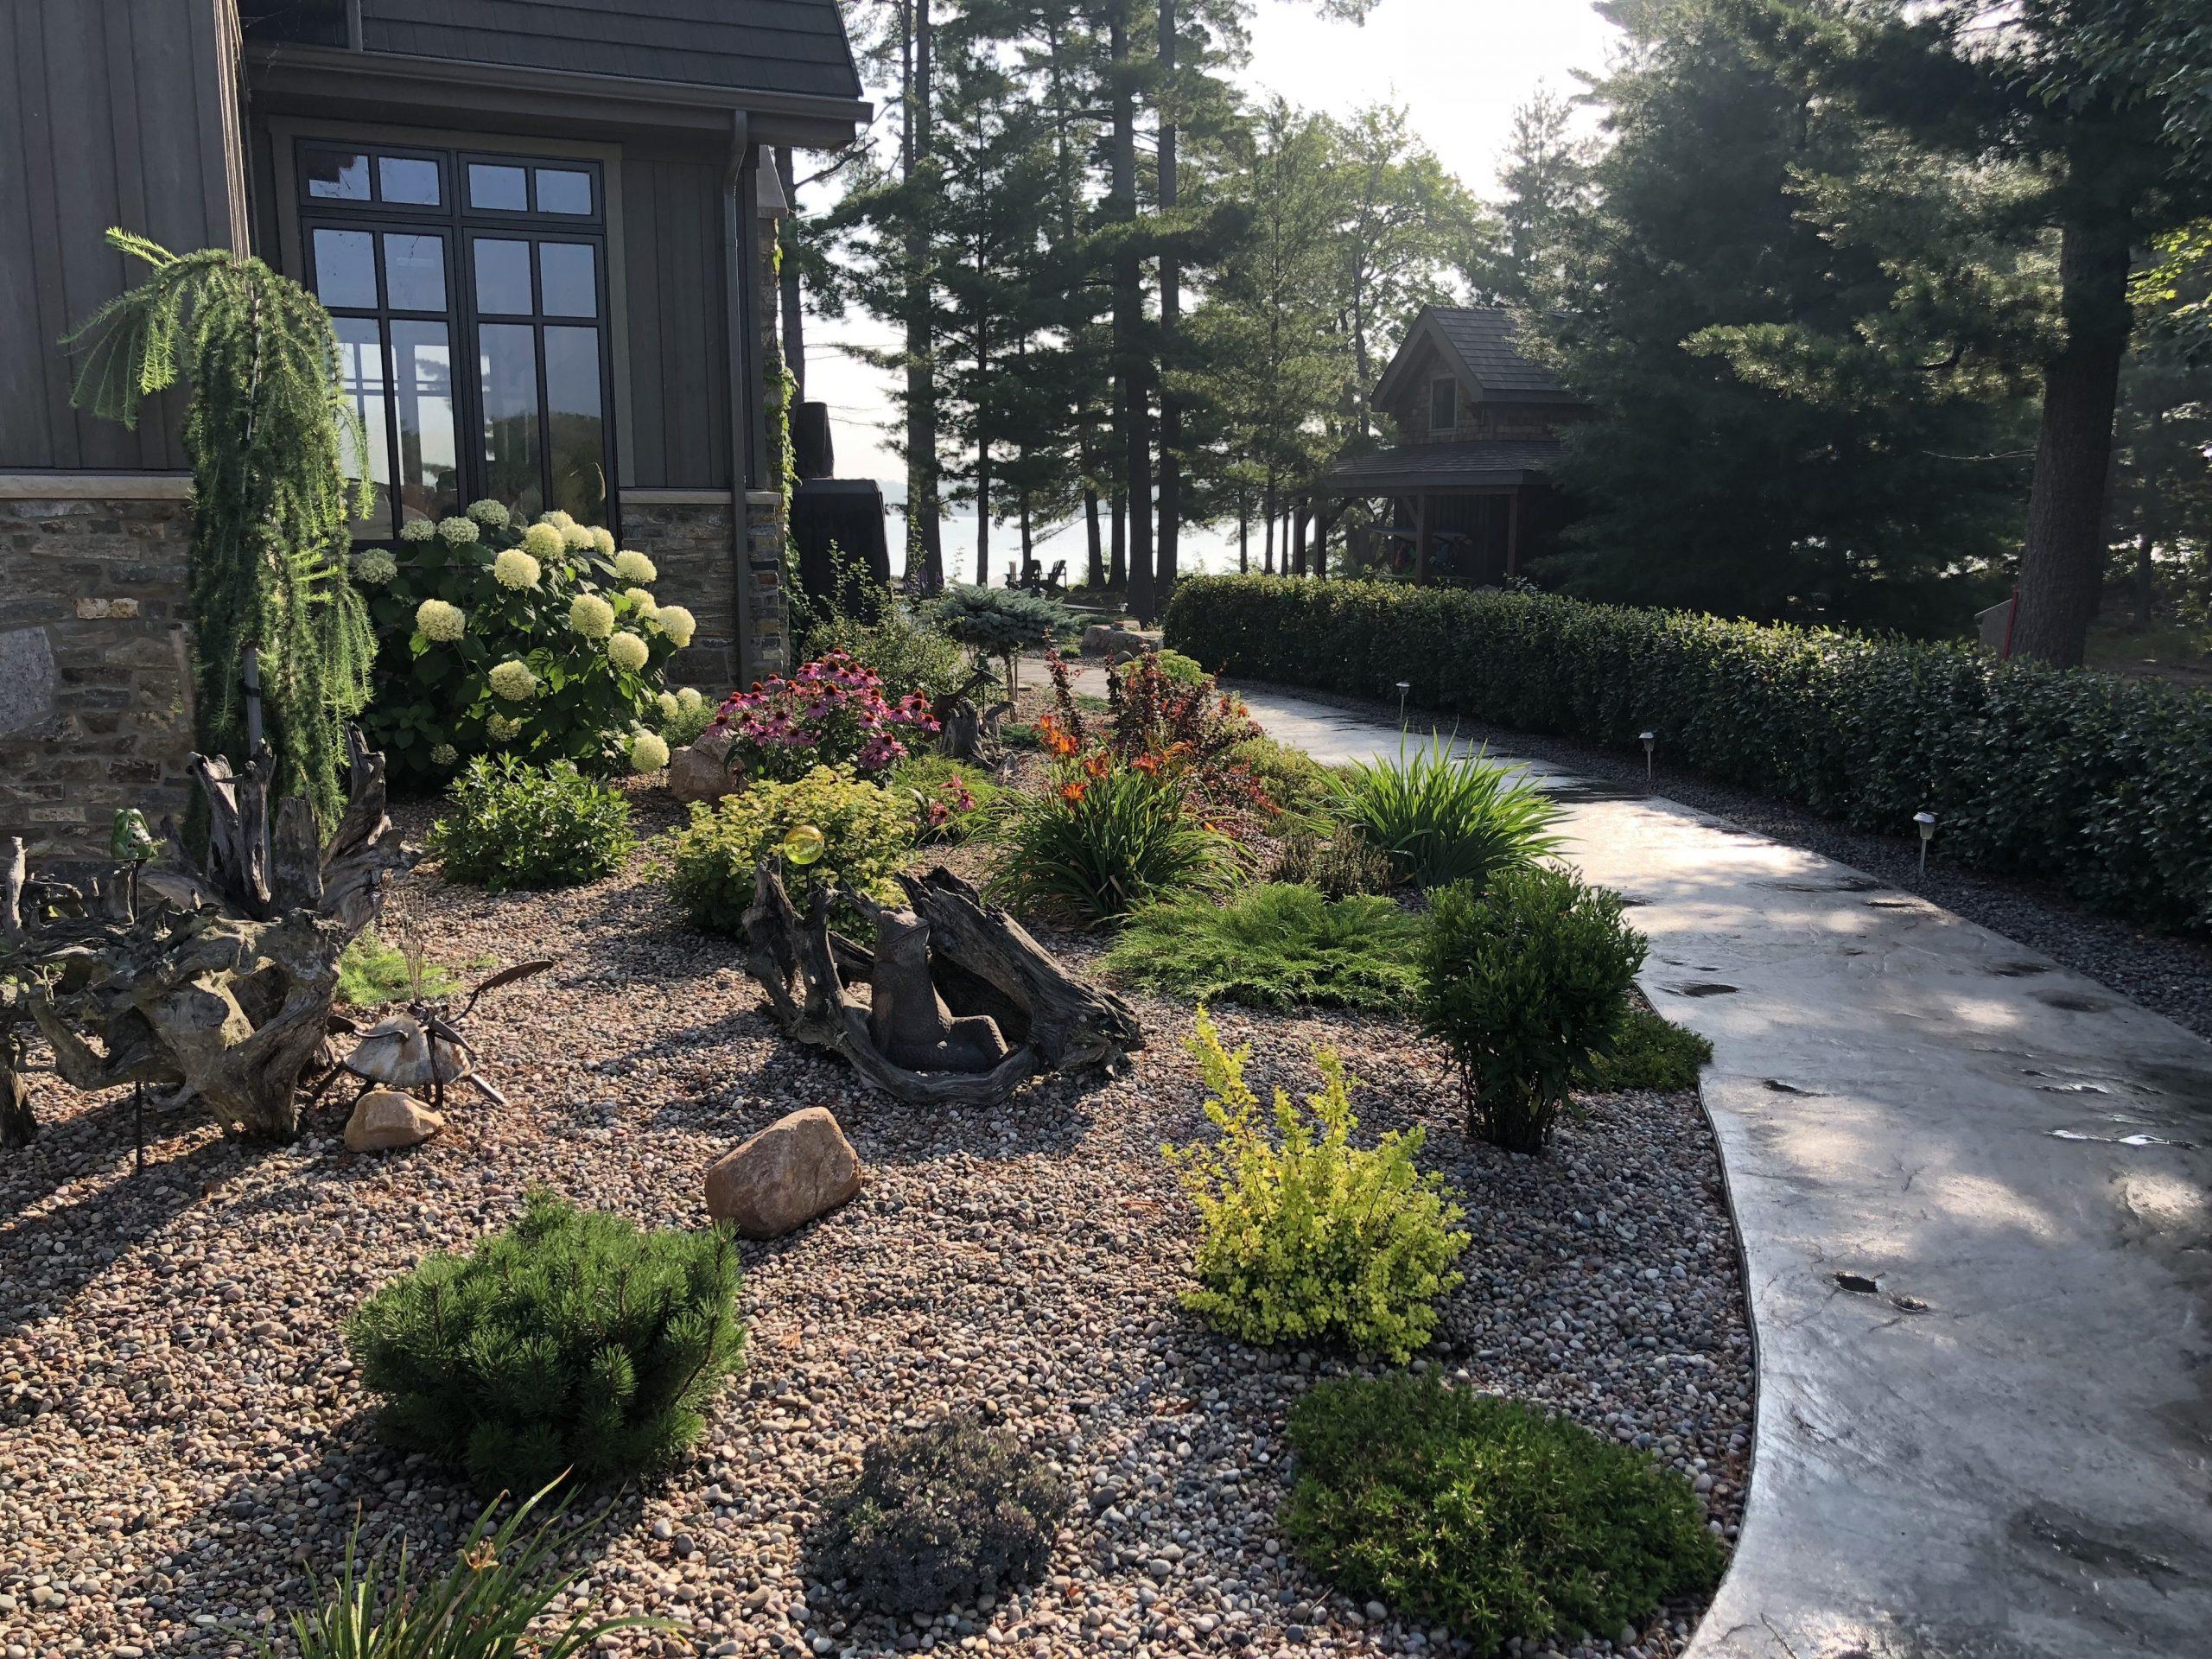 Normerica Timber Frame, Exterior, Cottage, Garden, Path